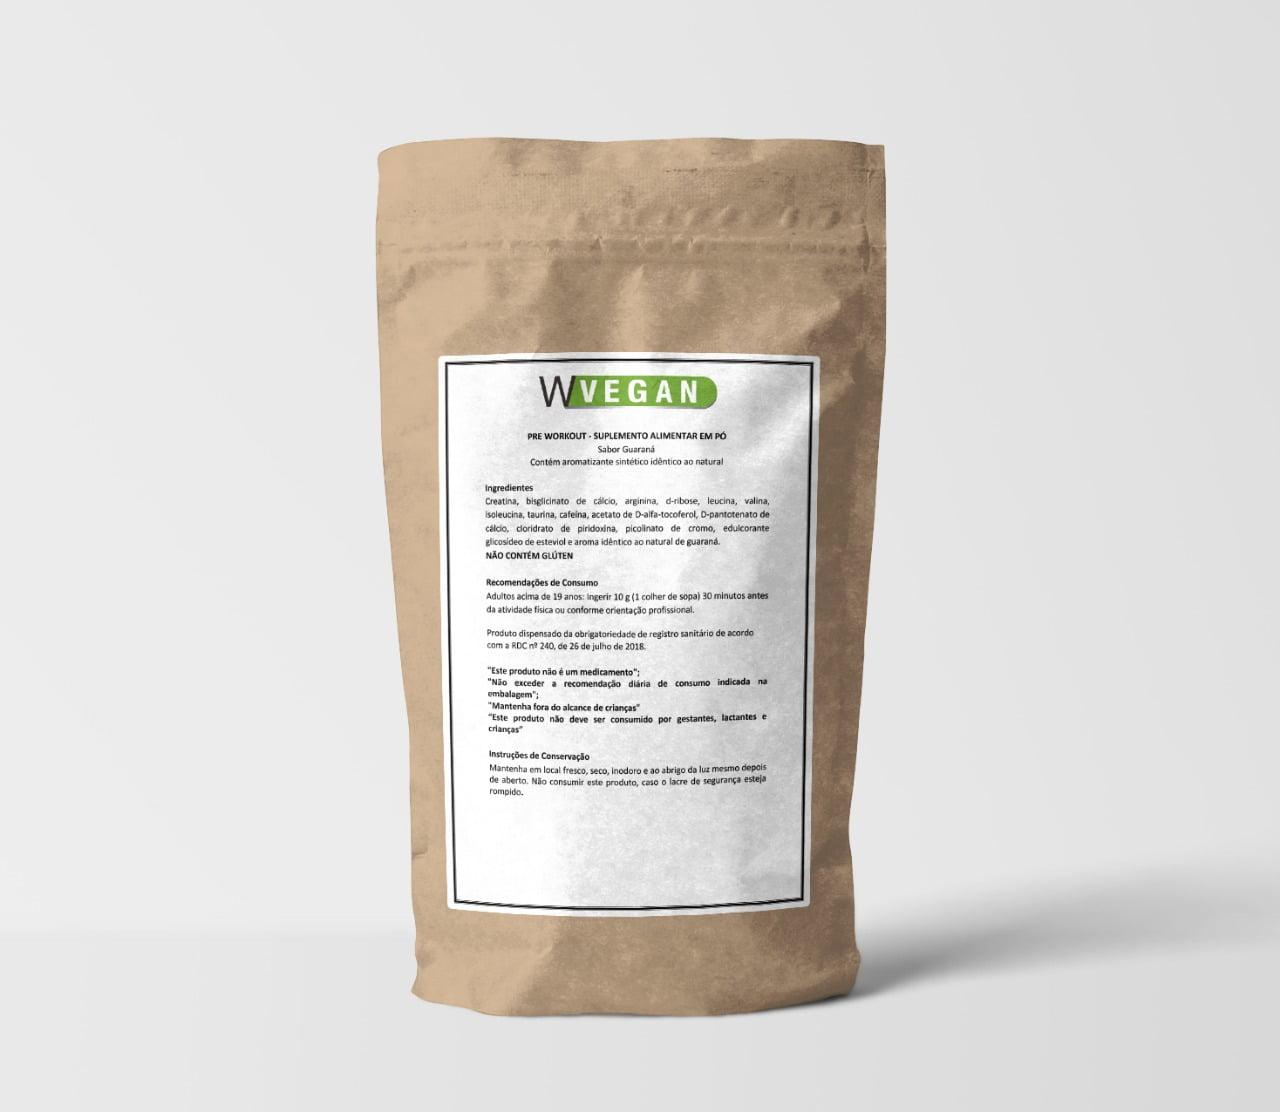 Pre Treino 200g Vegan Embalagem Refil – Sabor Guaraná